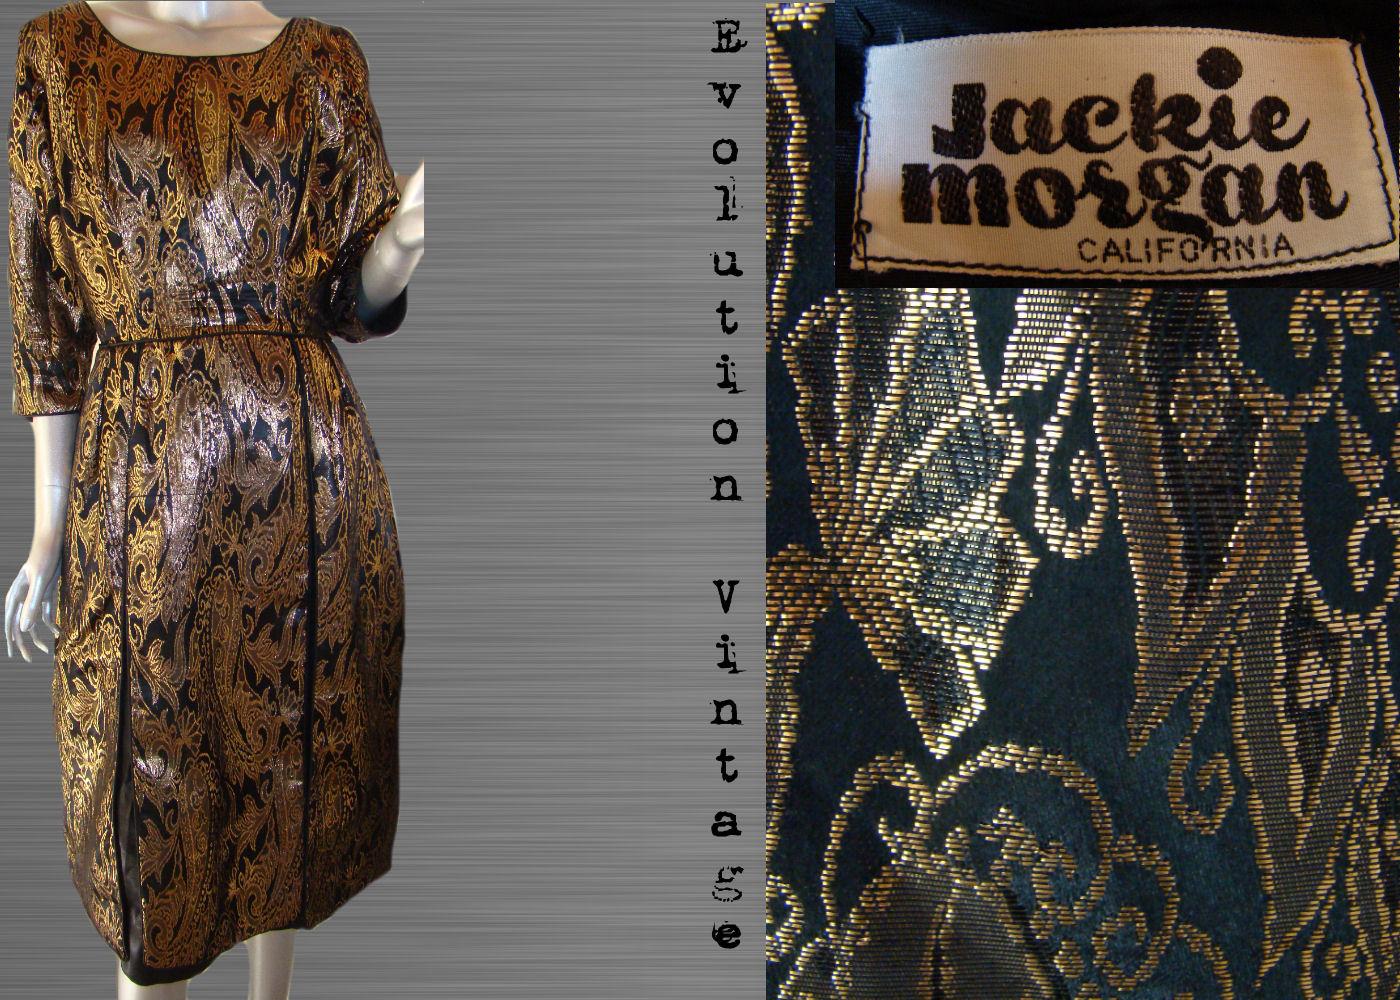 http://4.bp.blogspot.com/-2OgTS7YOQuI/UBRk6D9ToFI/AAAAAAAAE1E/78Nu2pLk474/s1600/Black+Meatllic+Gold+JAckie+Morgan+dress.jpg